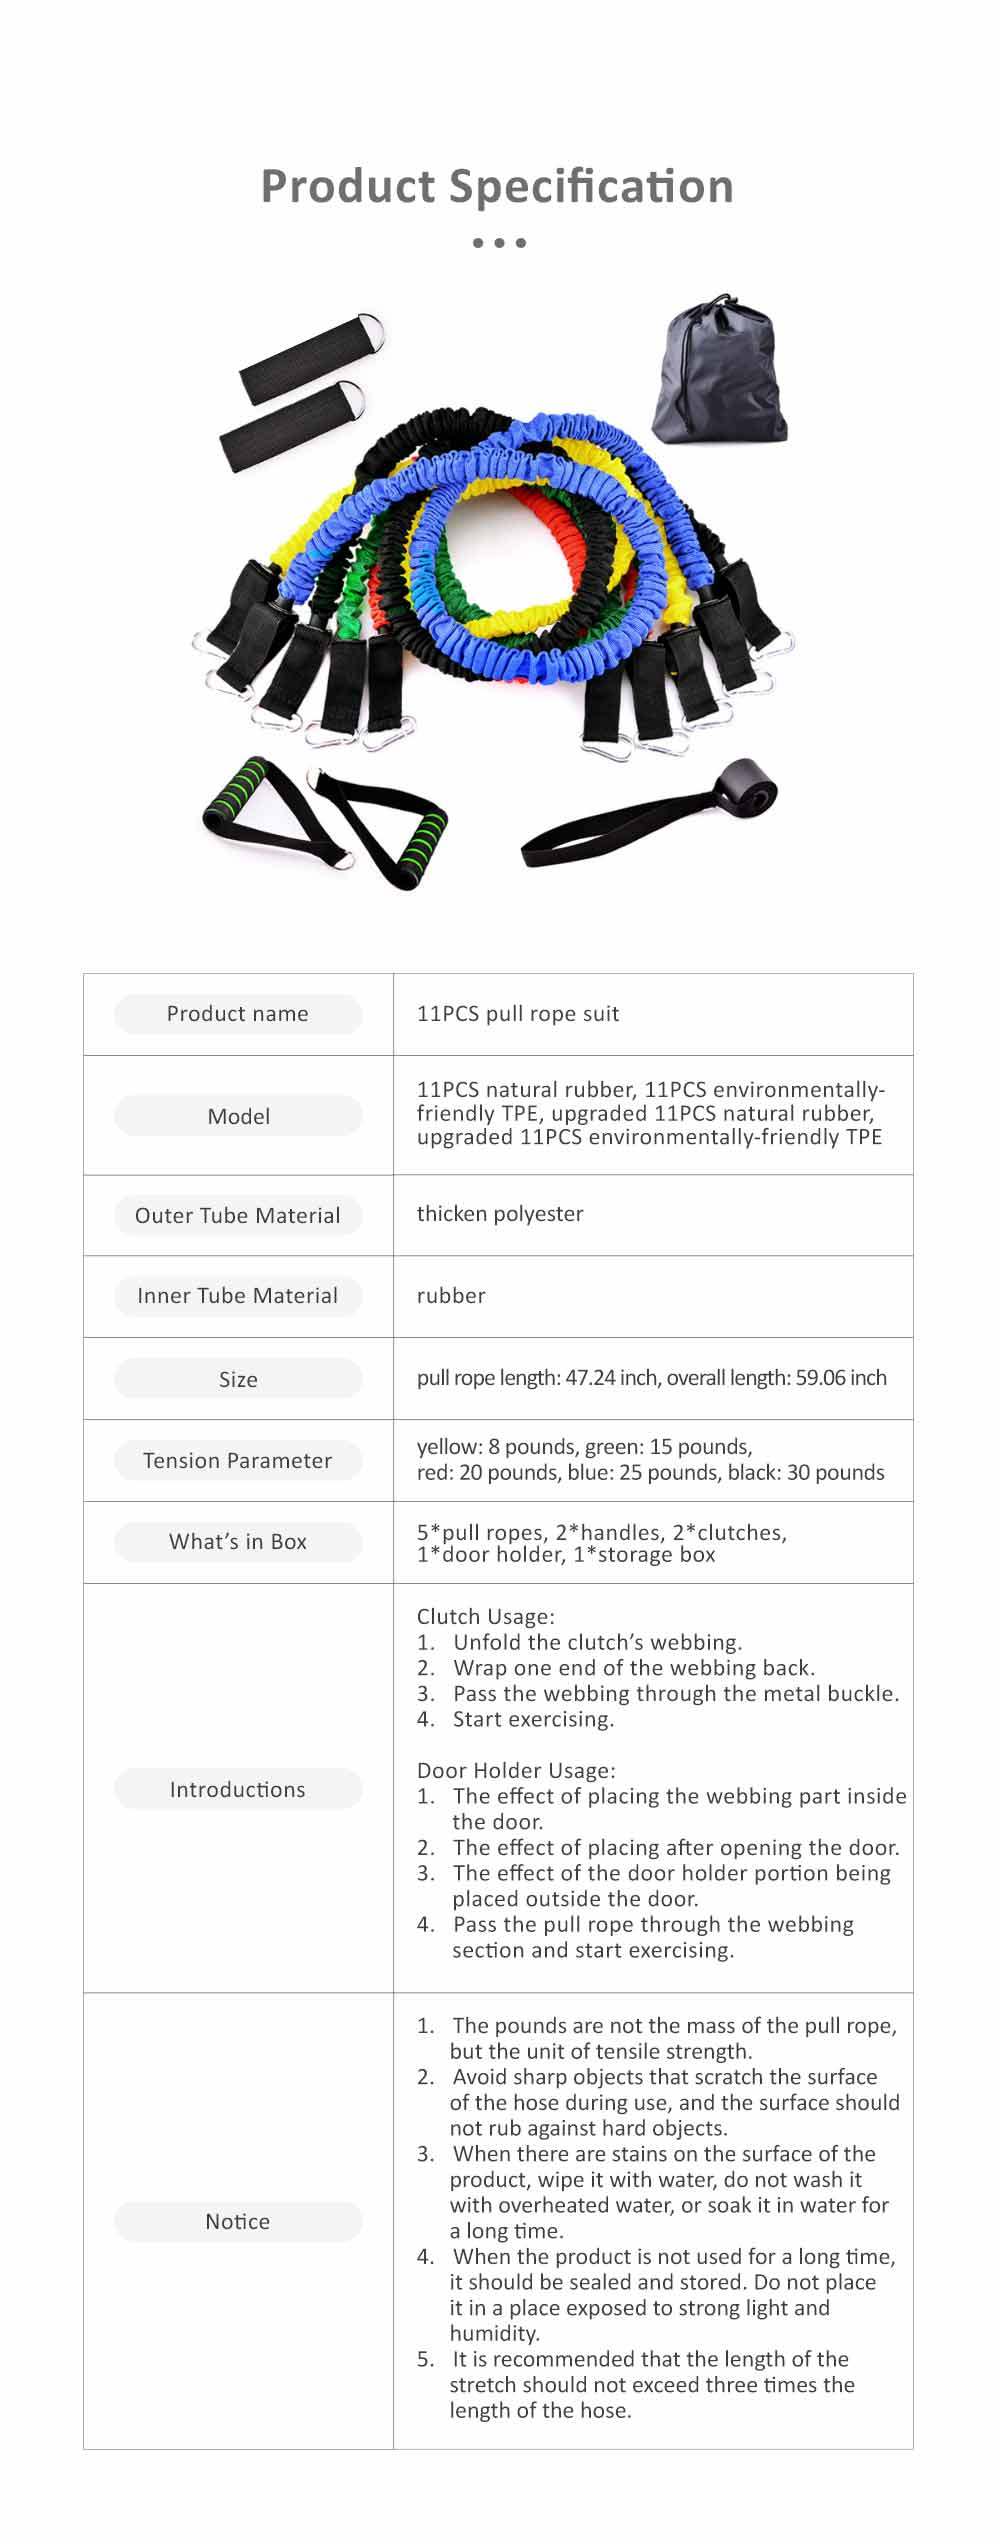 Multifunctional Safe Breaking-proof 11PCS Pull Rope Suit, Gym Yoga Training Exercising Elastic Resistance Band 10